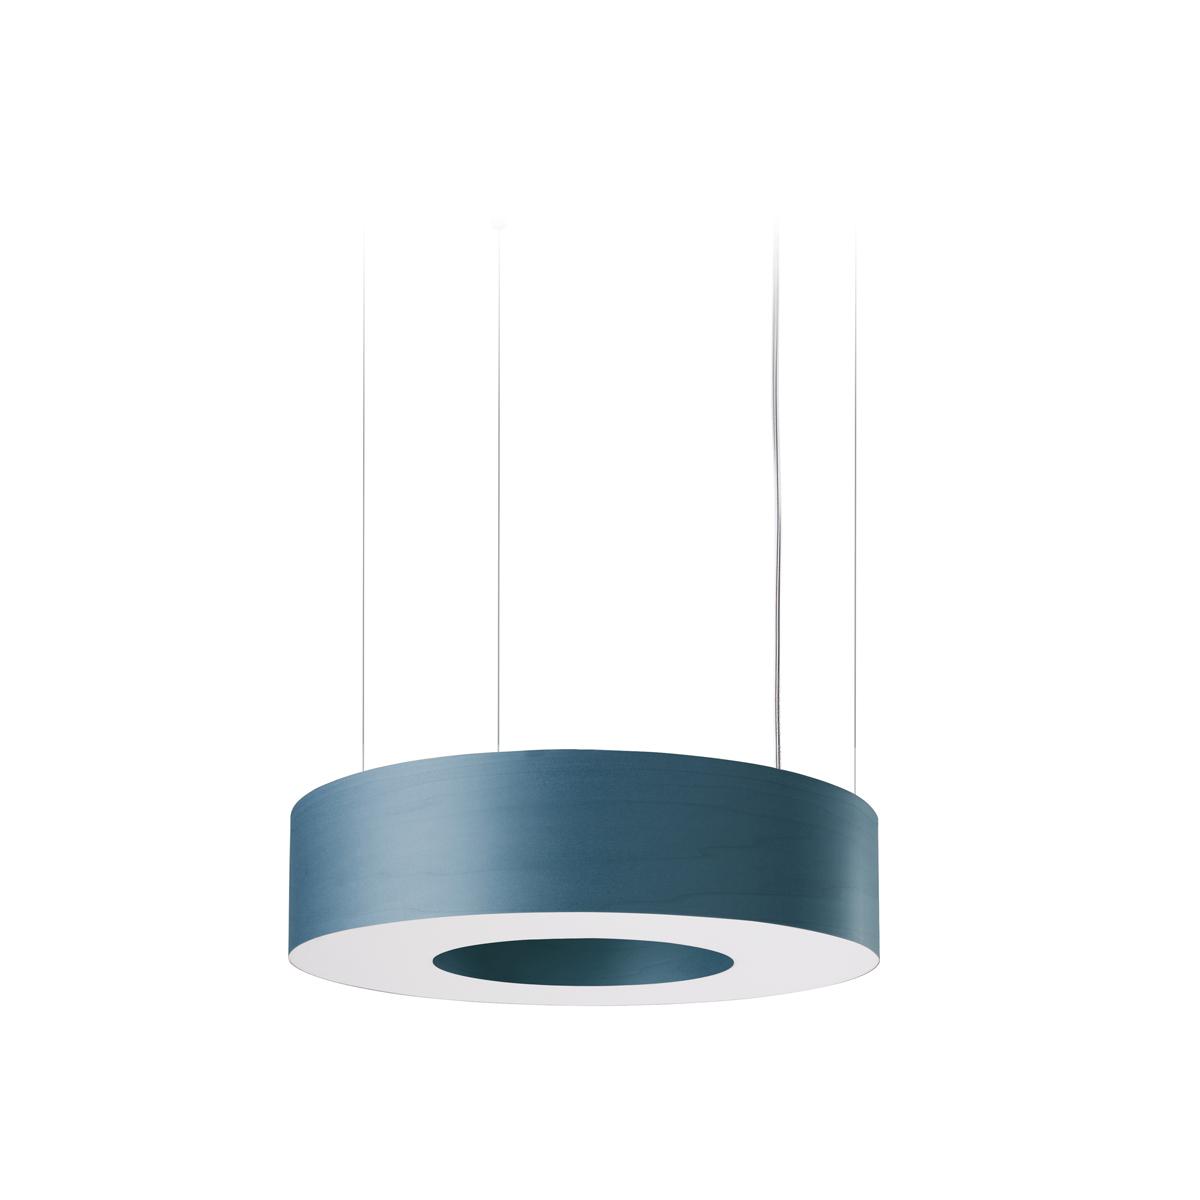 LZF Lamps Saturnia Small LED Pendelleuchte SAT SP LED DIM0-10V 28